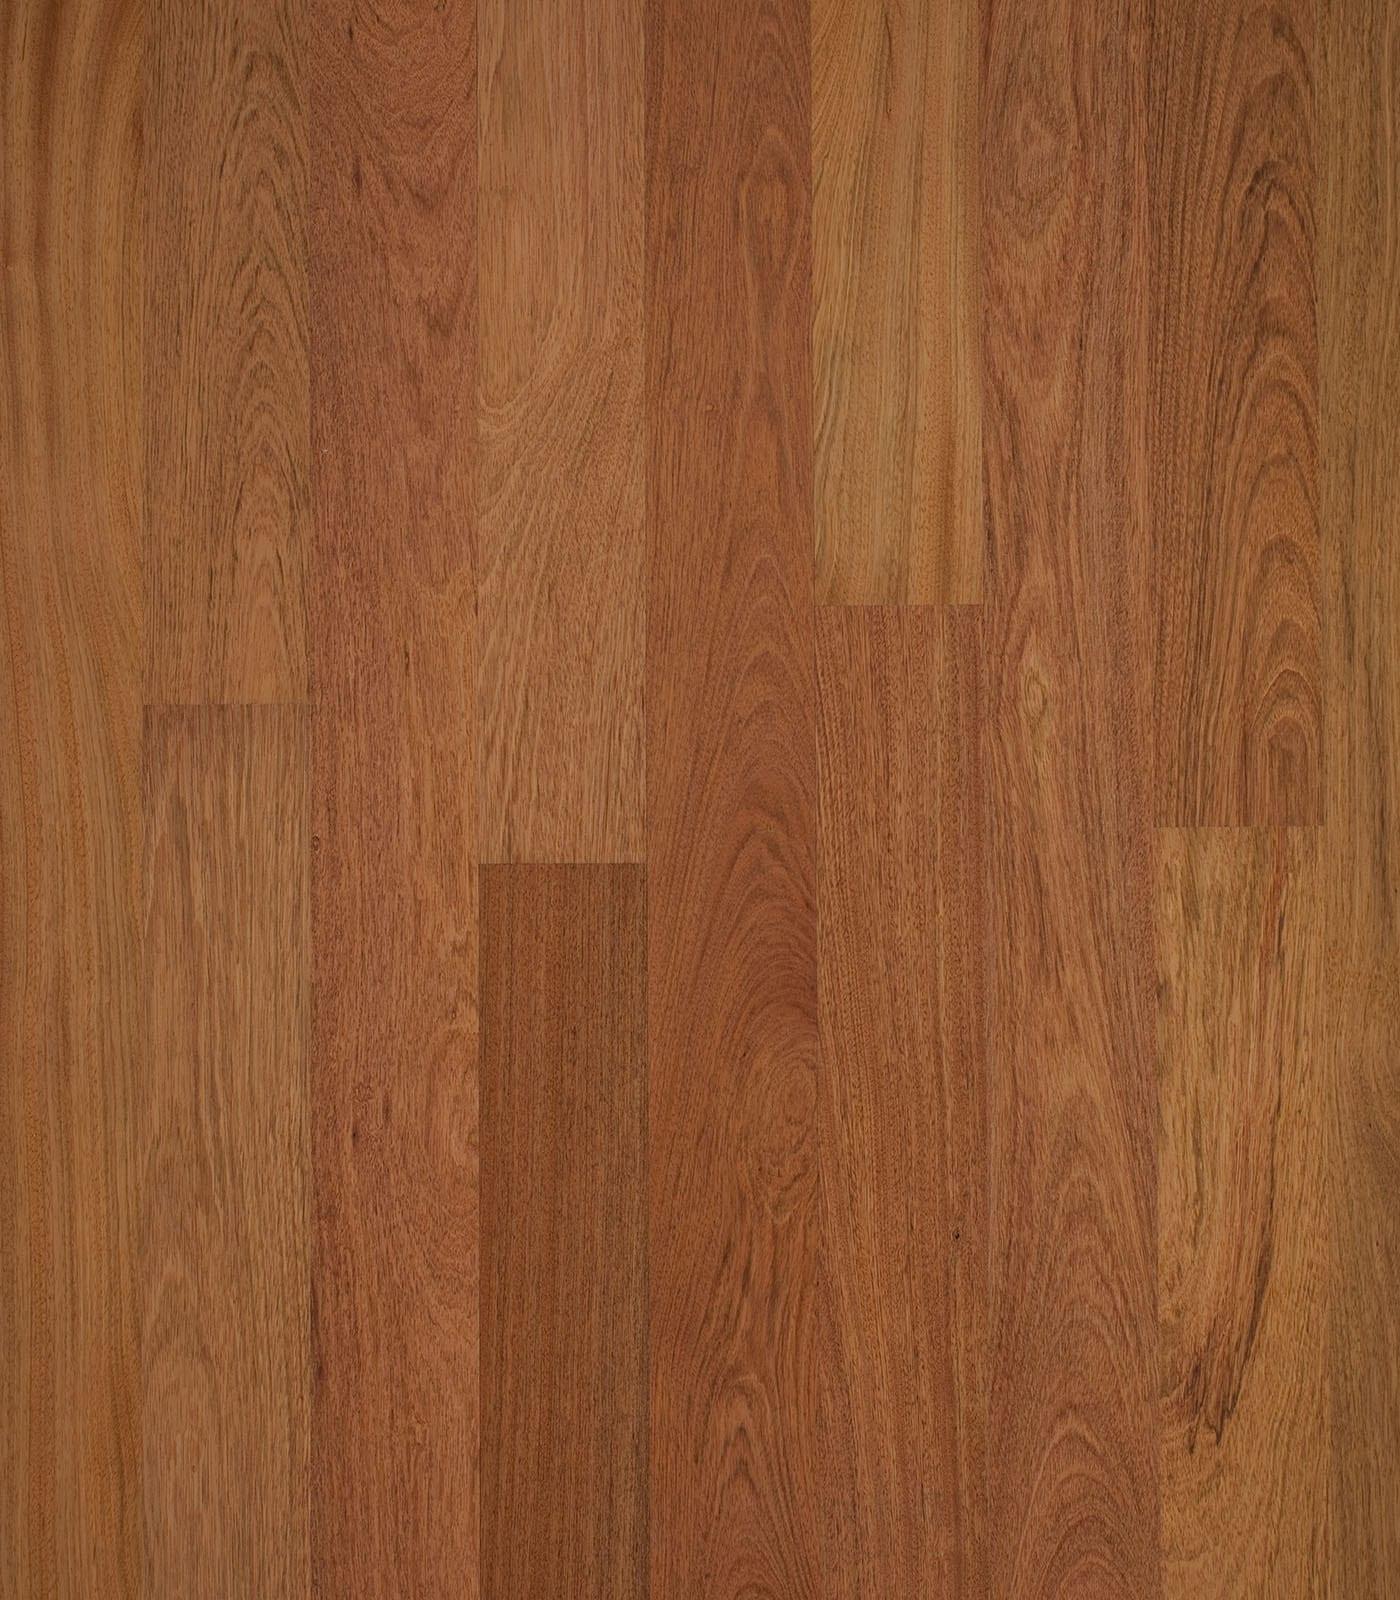 Jatoba-Origins Collection-engineered floors